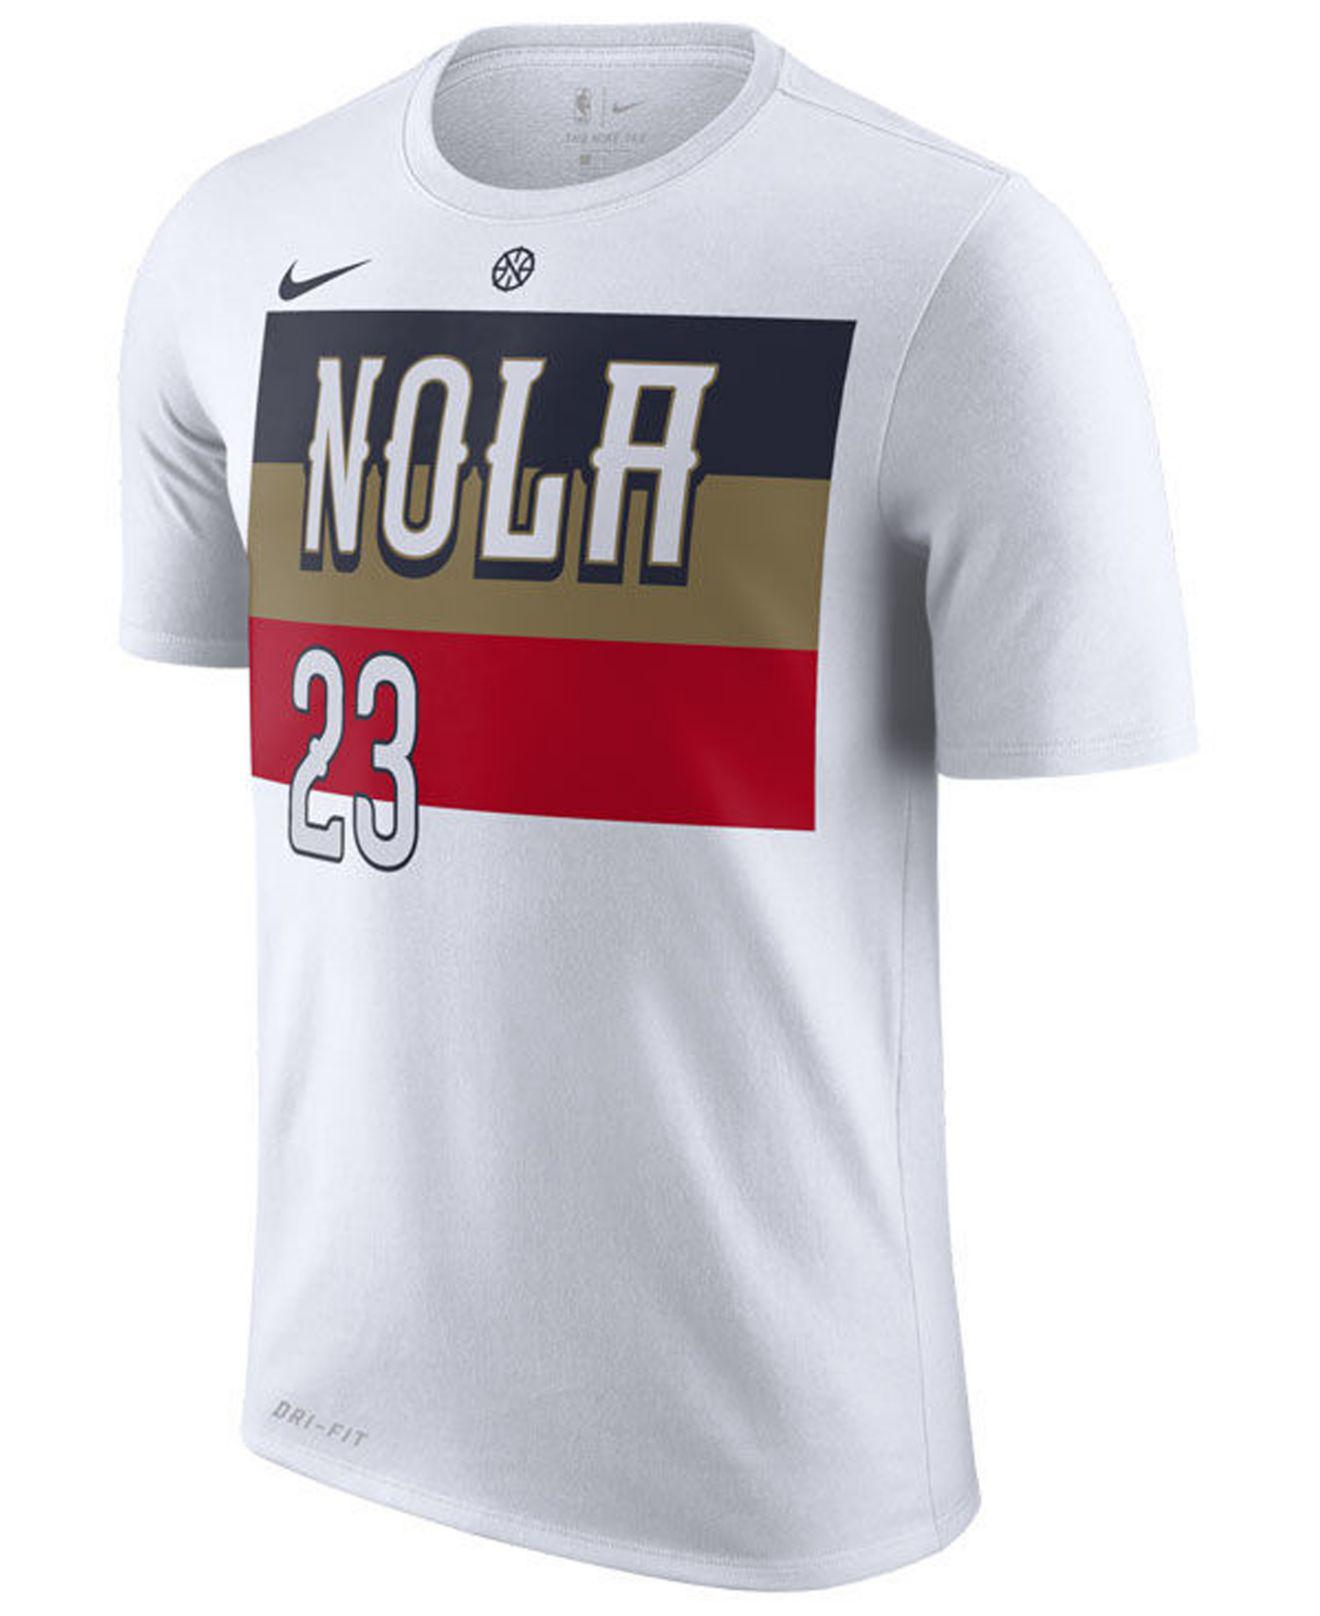 Nike - White Anthony Davis New Orleans Pelicans Earned Edition Player T- shirt for Men. View fullscreen aecbb1798